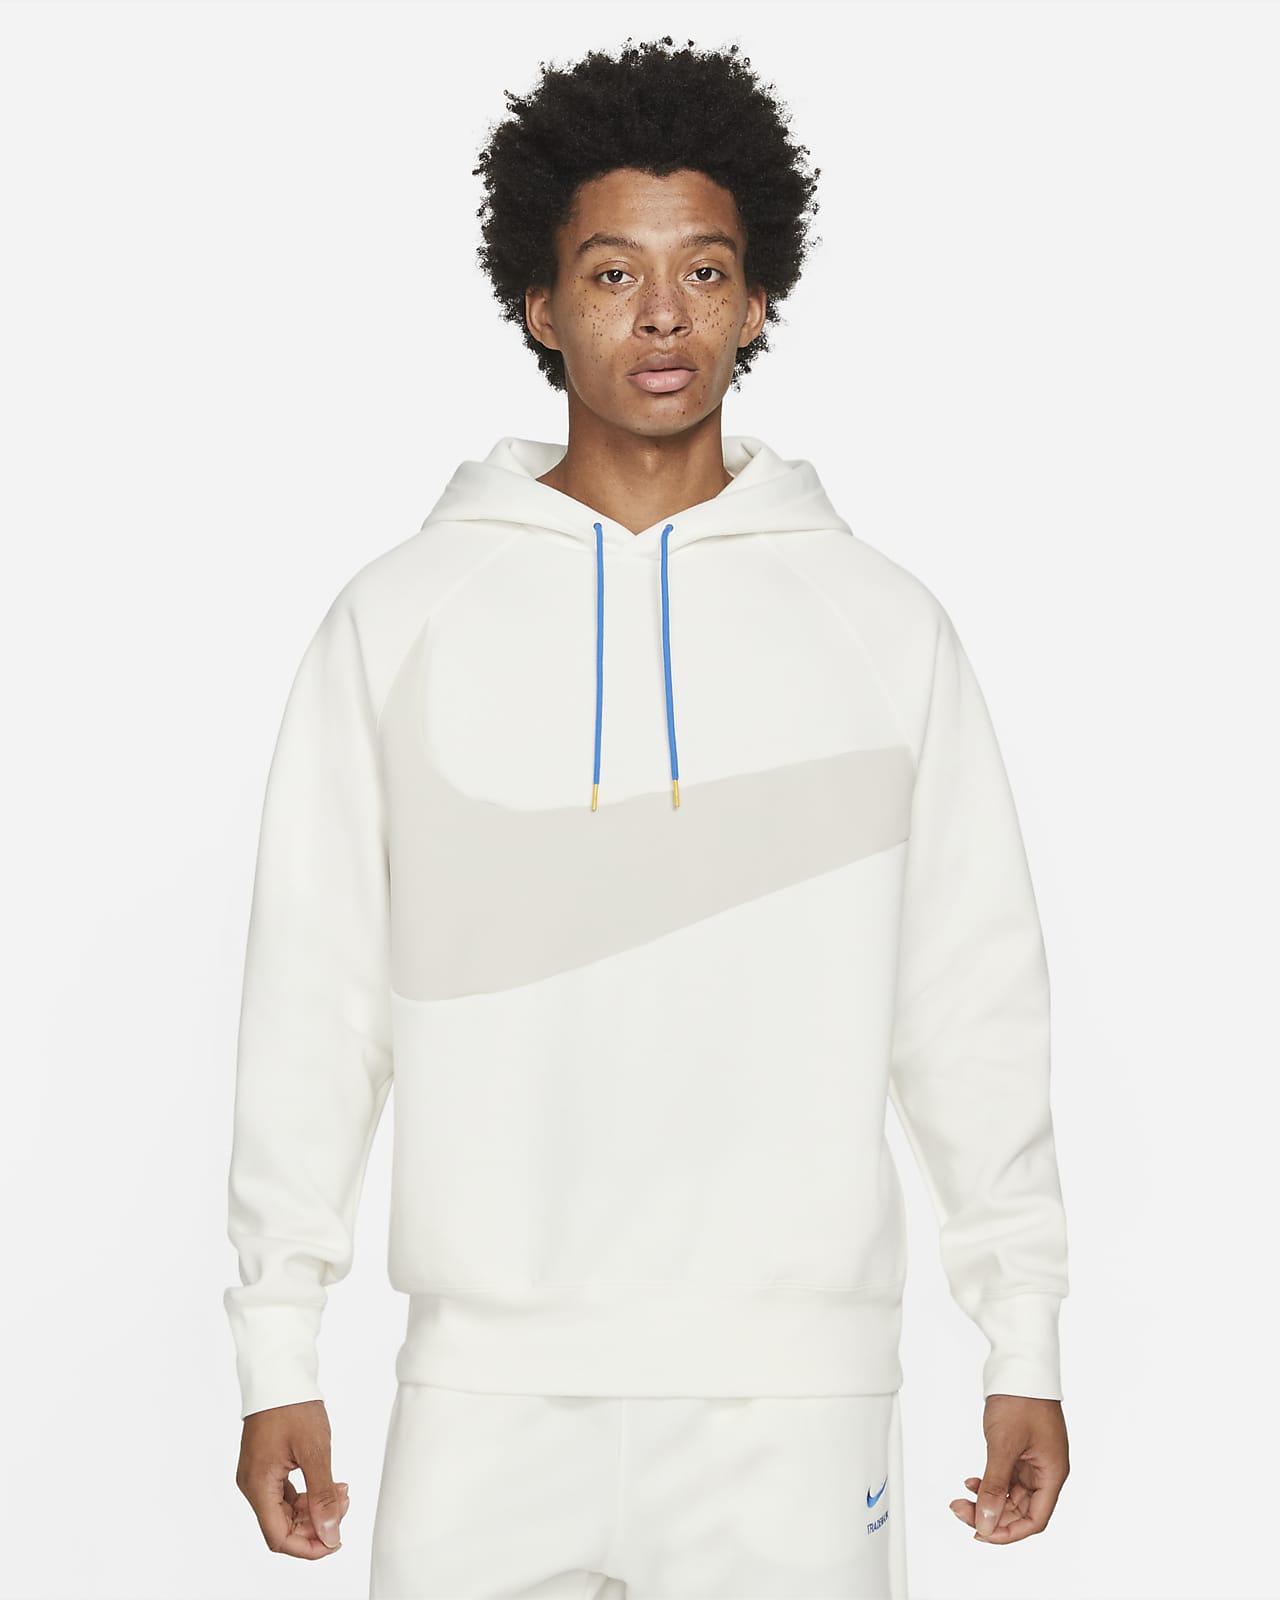 Pánská mikina Nike Sportswear Swoosh Tech Fleece skapucí